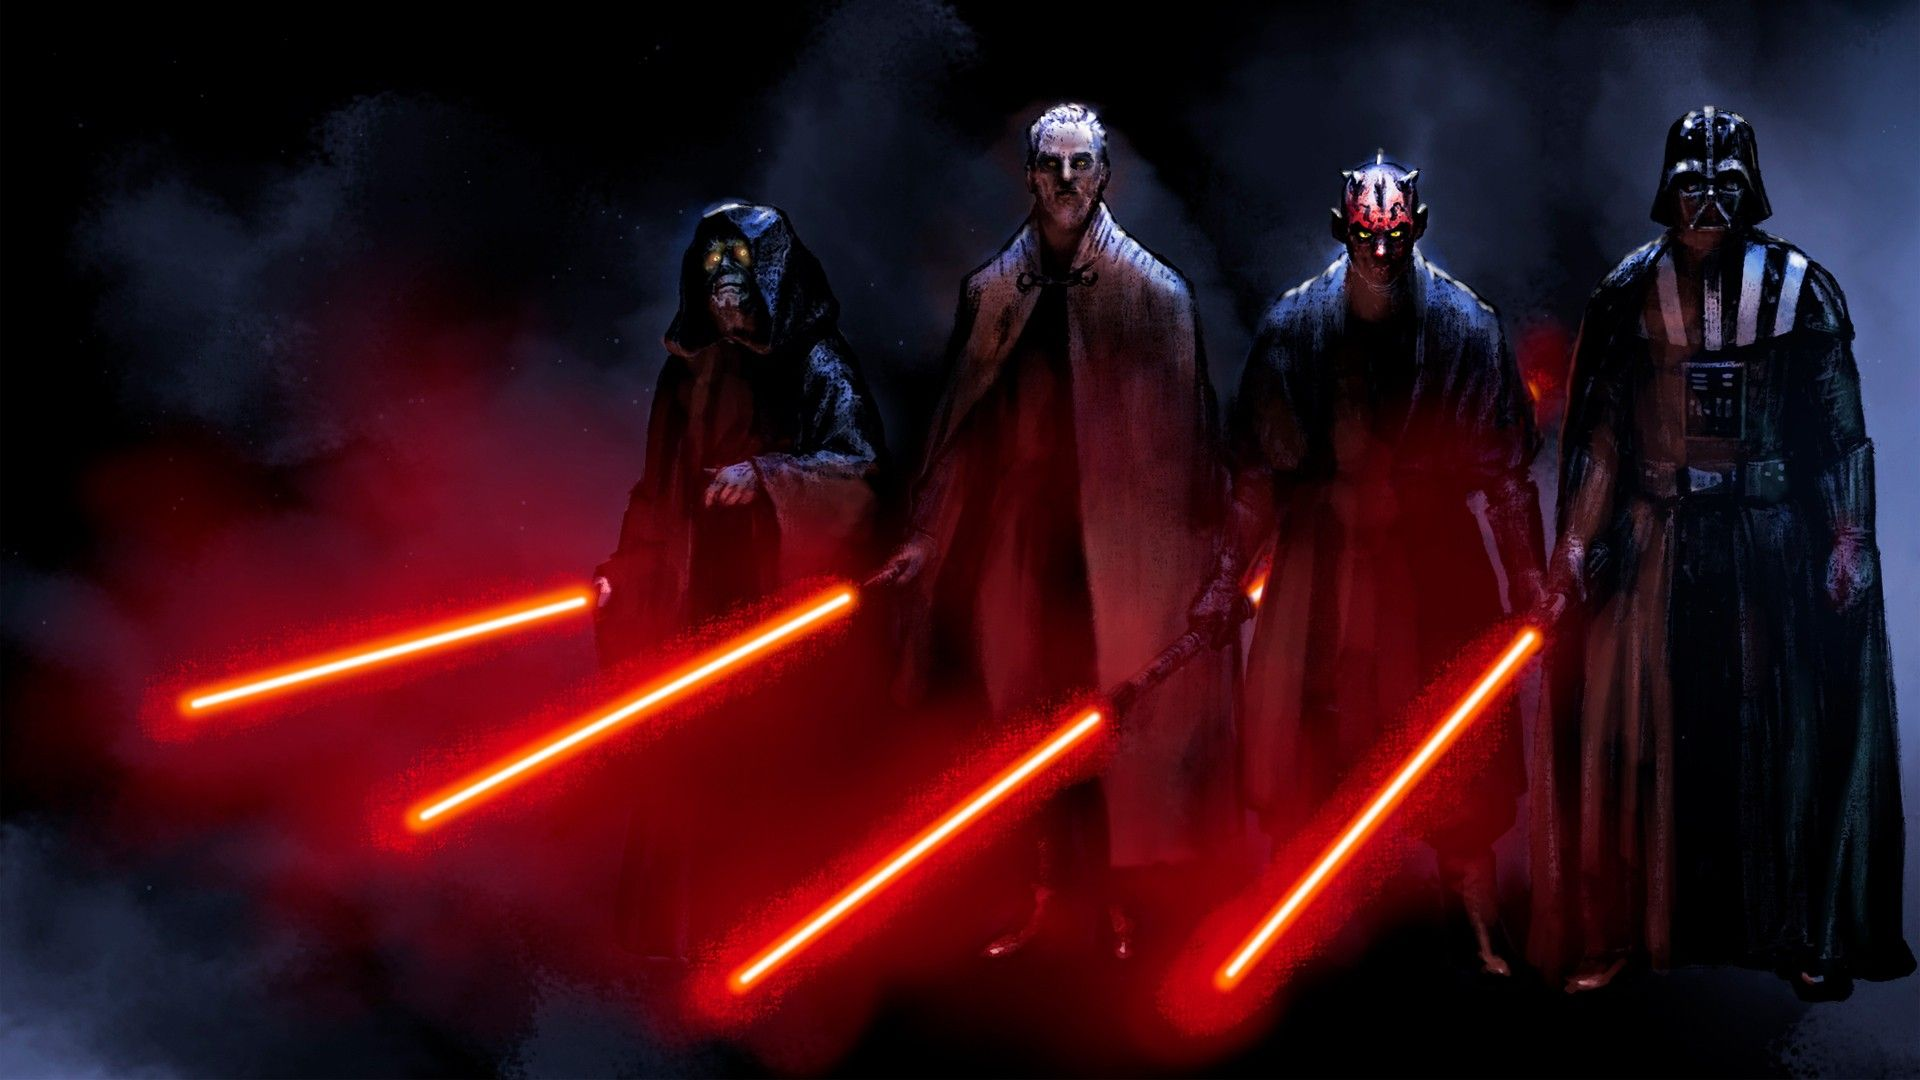 Star Wars Red Darth Maul Lightsabers Darth Vader Sith Dark Side